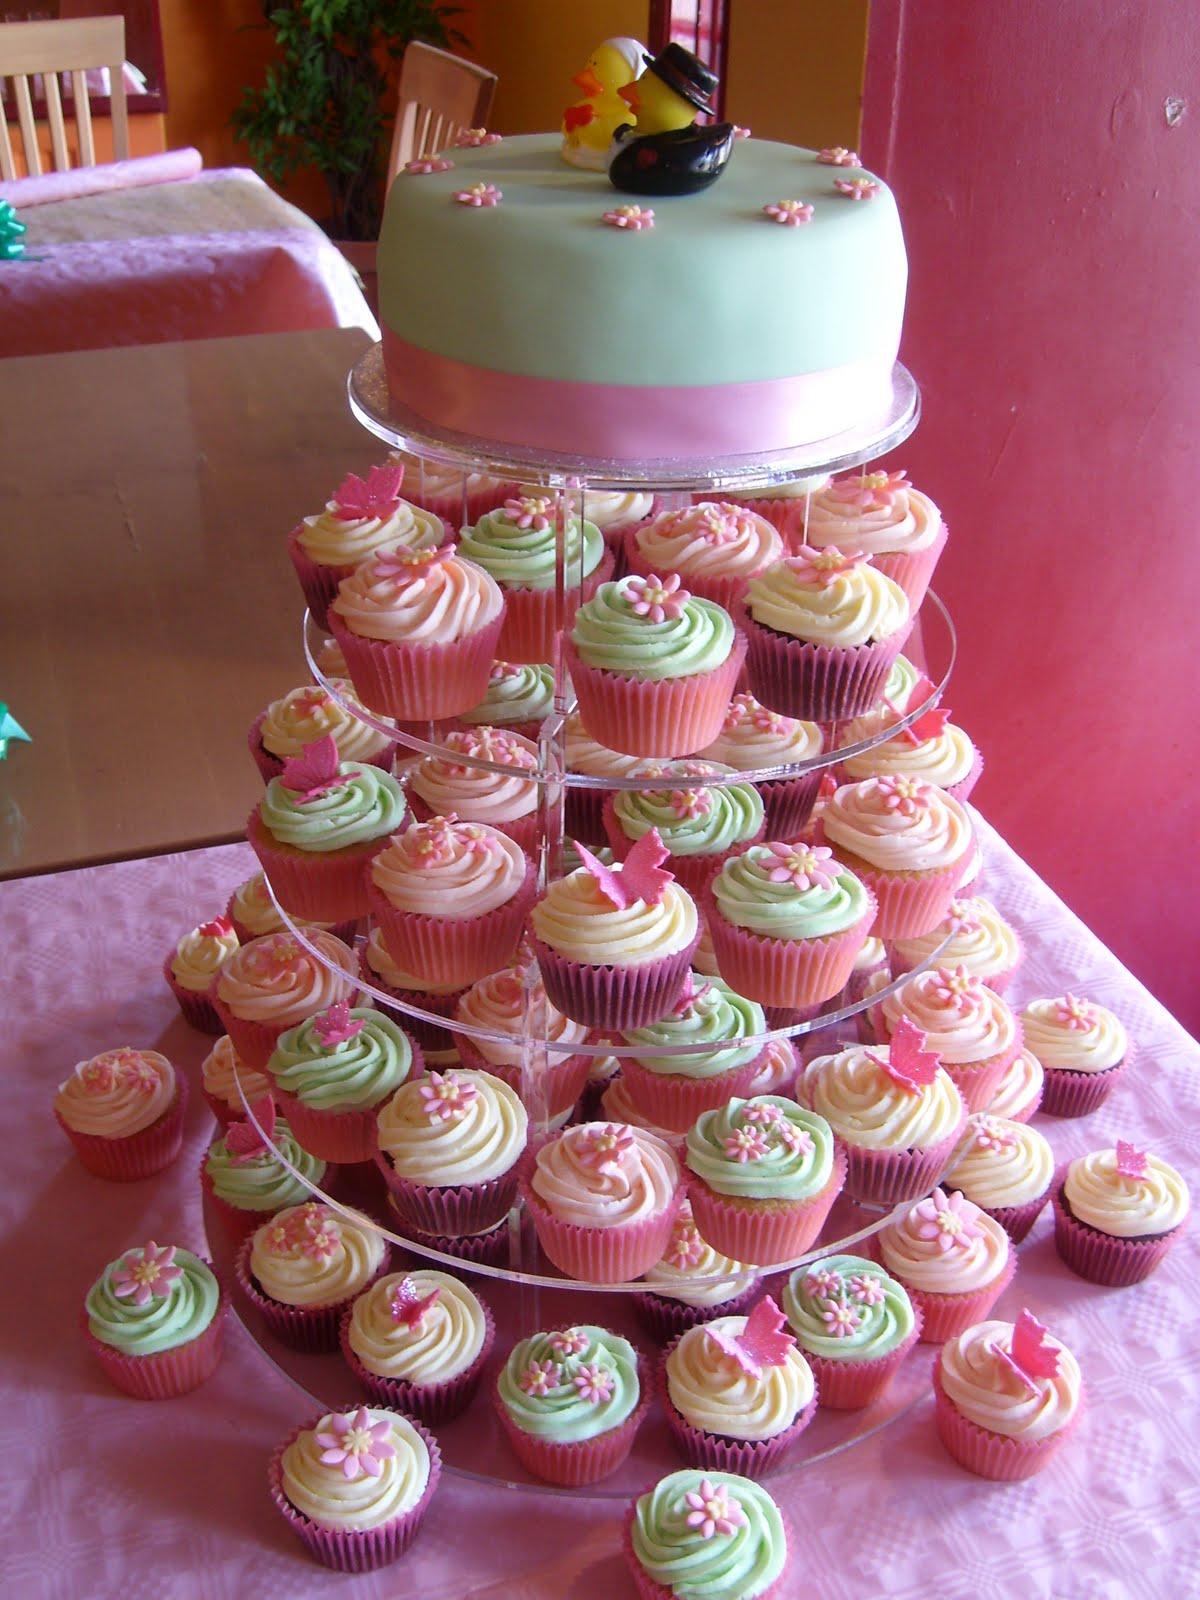 teeny cupcakes wedding cakes. Black Bedroom Furniture Sets. Home Design Ideas